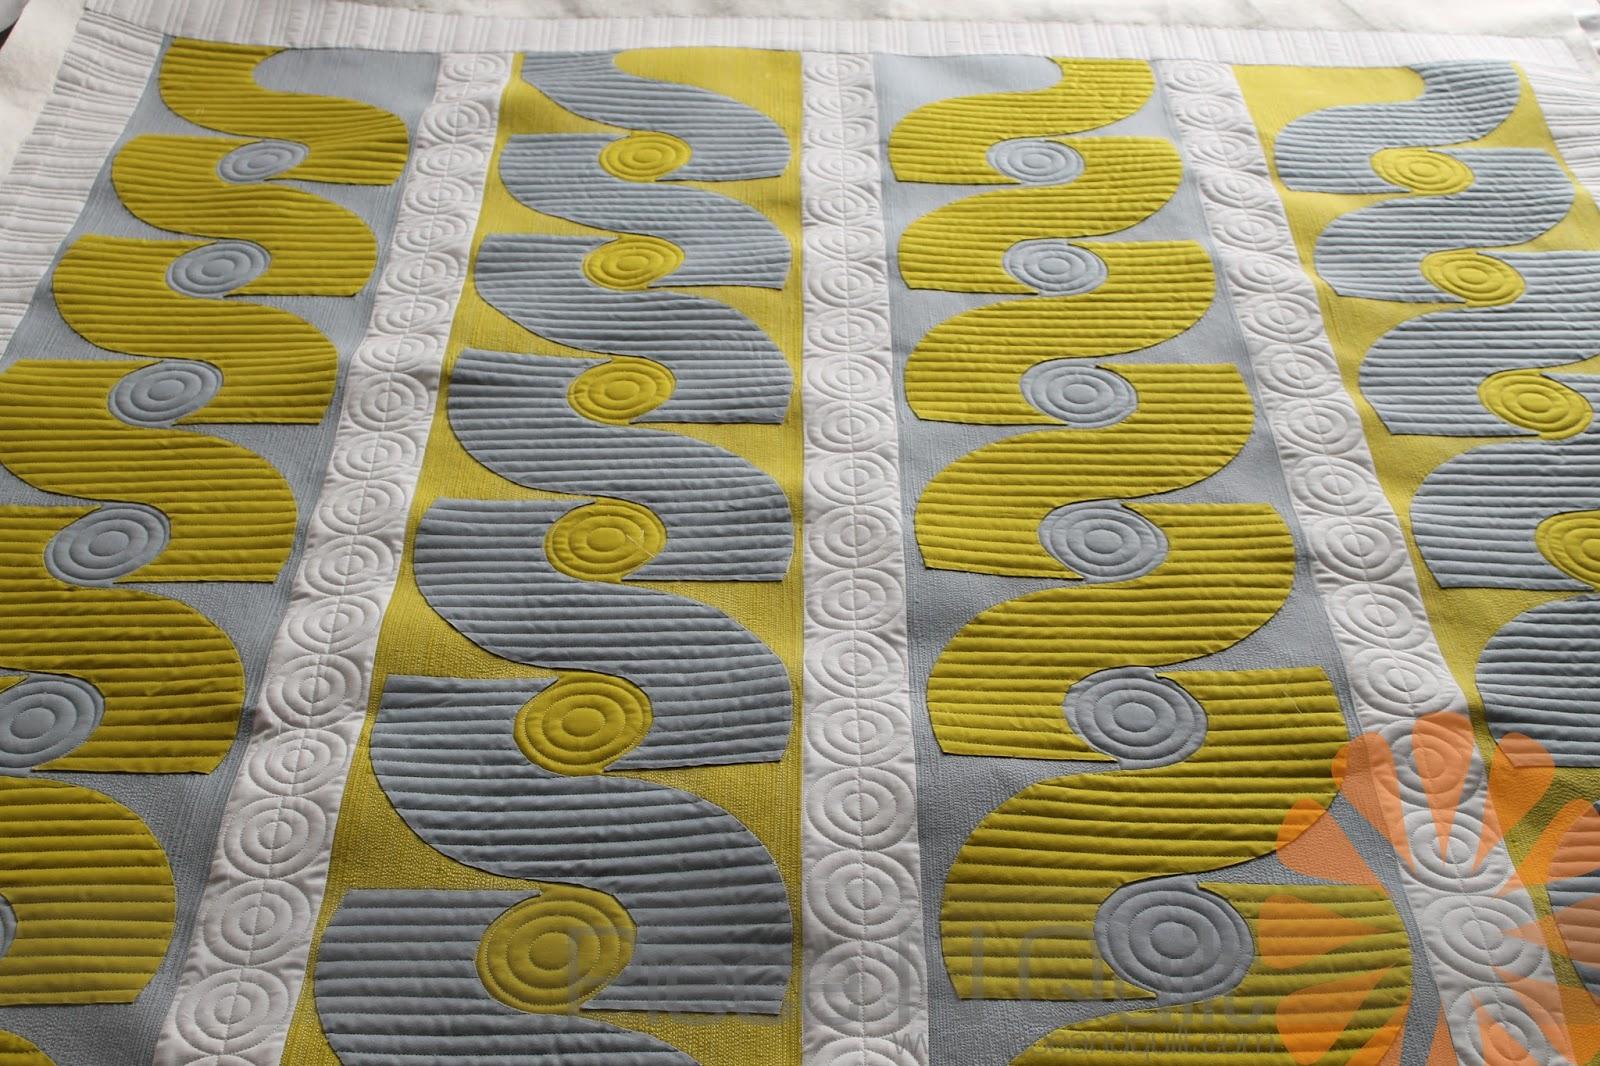 Piece N Quilt: Custom Machine Quilting a Modern Quilt - by ... - photo#15